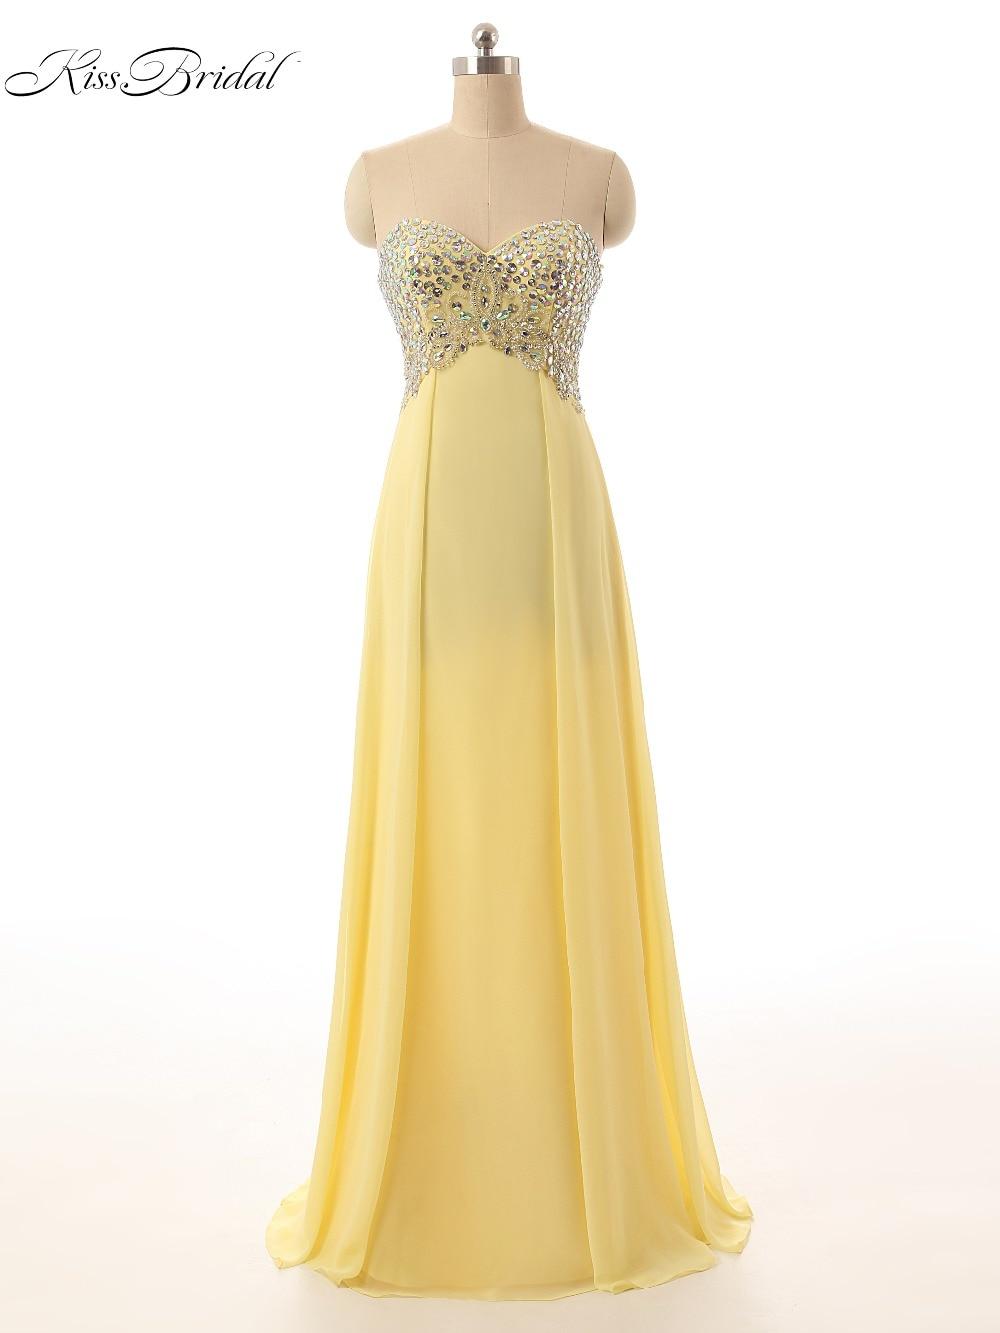 Sexy Prom Dresses Beaded Sweetheart Sleeveless Vestidos De Festa Floor Length Zipper Back Formal Evening Party Gowns